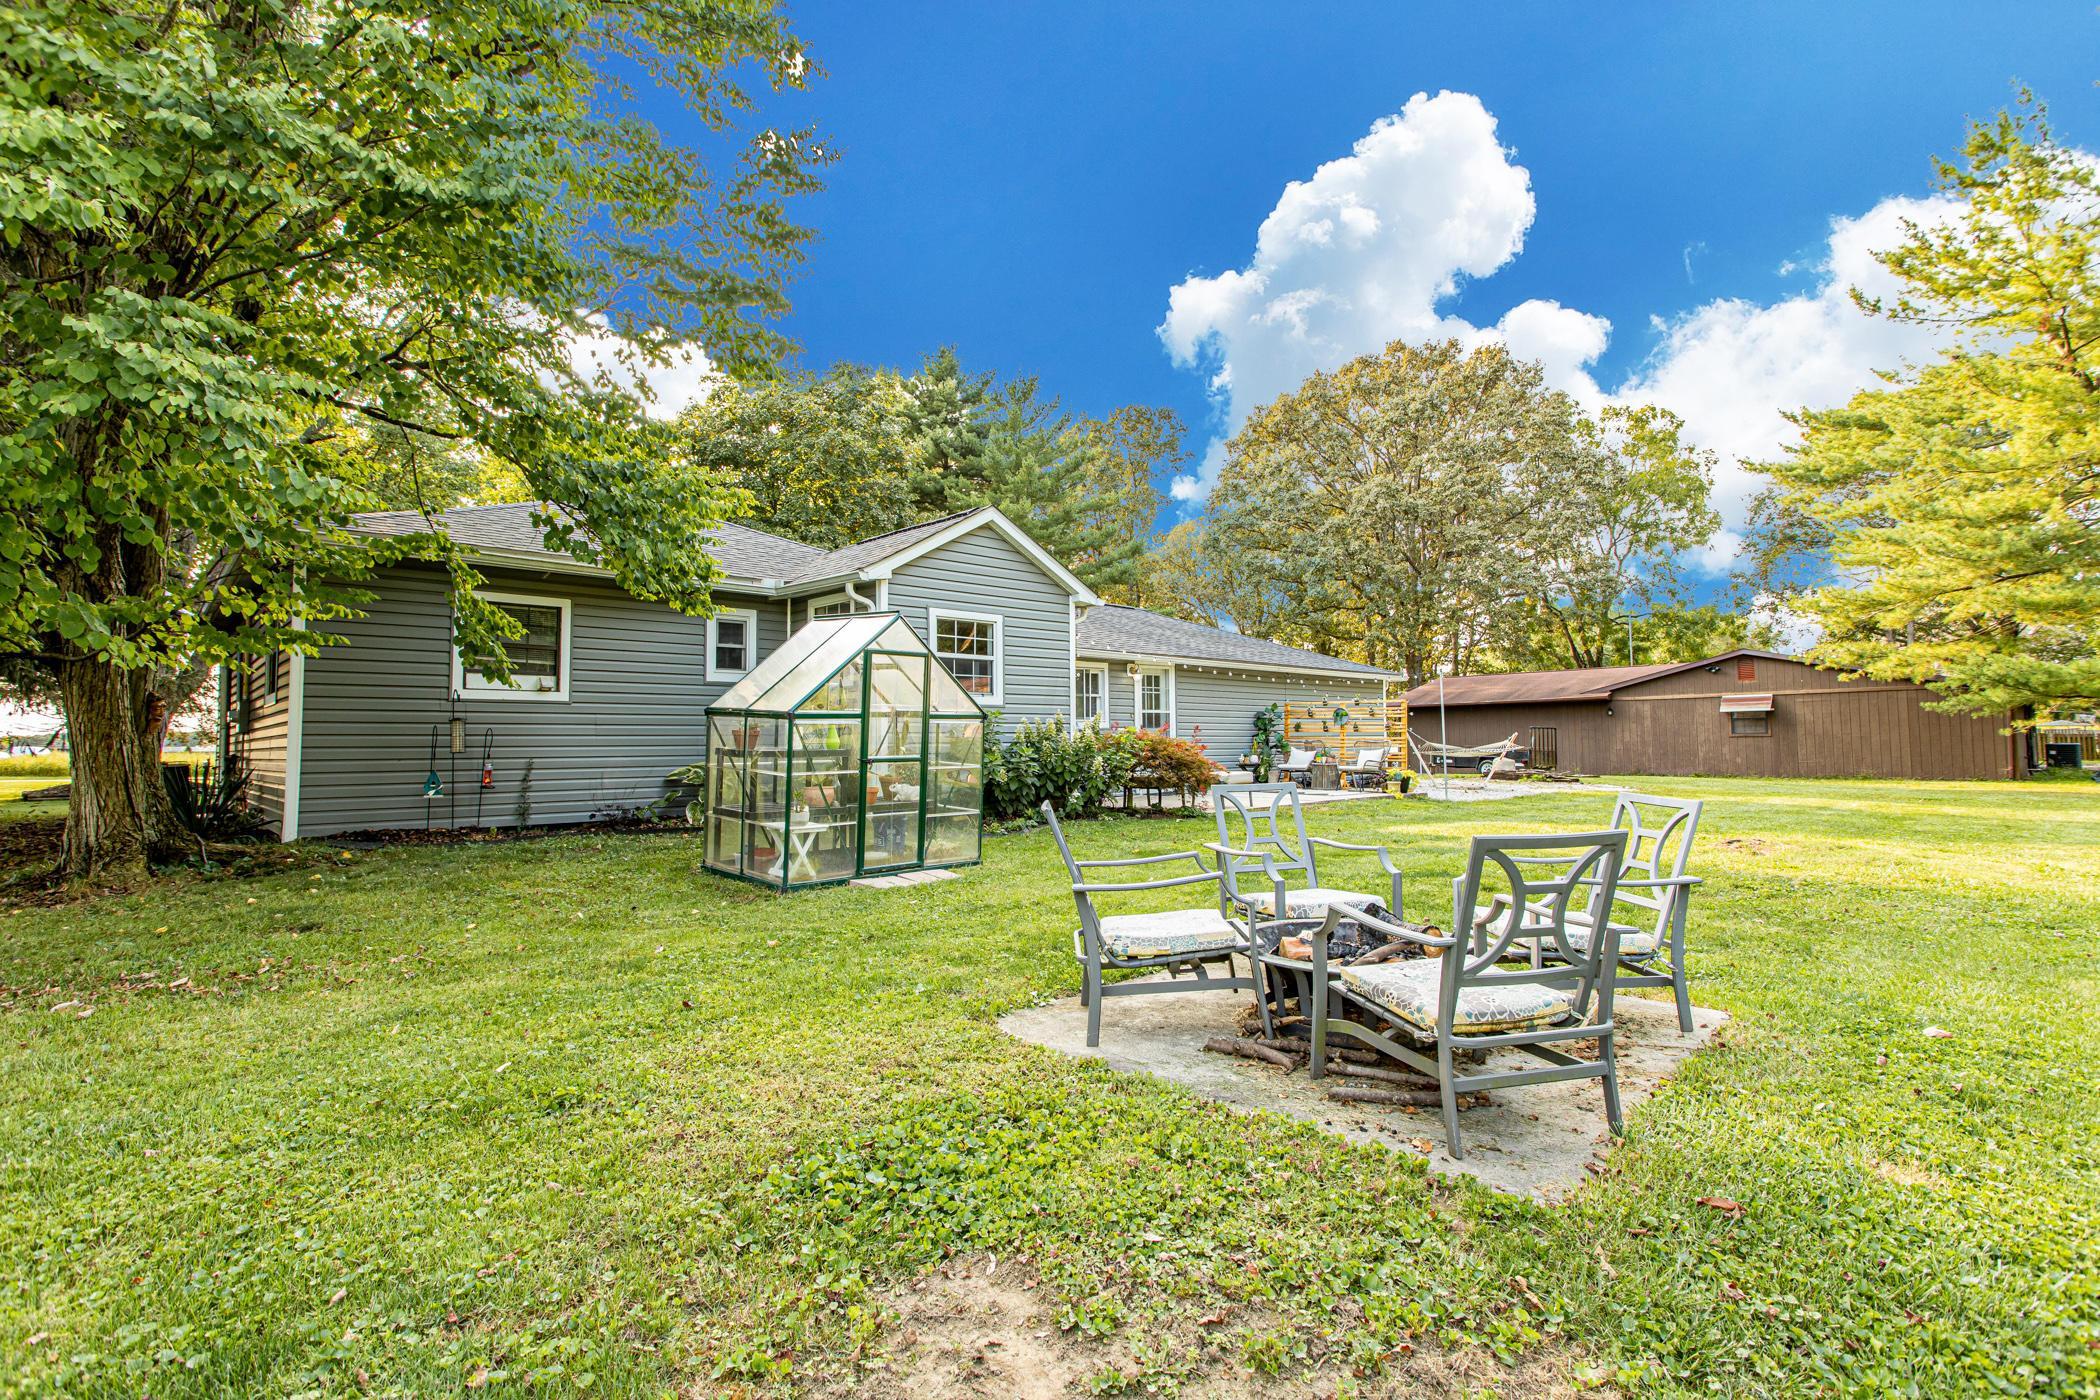 930 Hibbs Road, Lockbourne, Ohio 43137, 3 Bedrooms Bedrooms, ,2 BathroomsBathrooms,Residential,For Sale,Hibbs,220032427